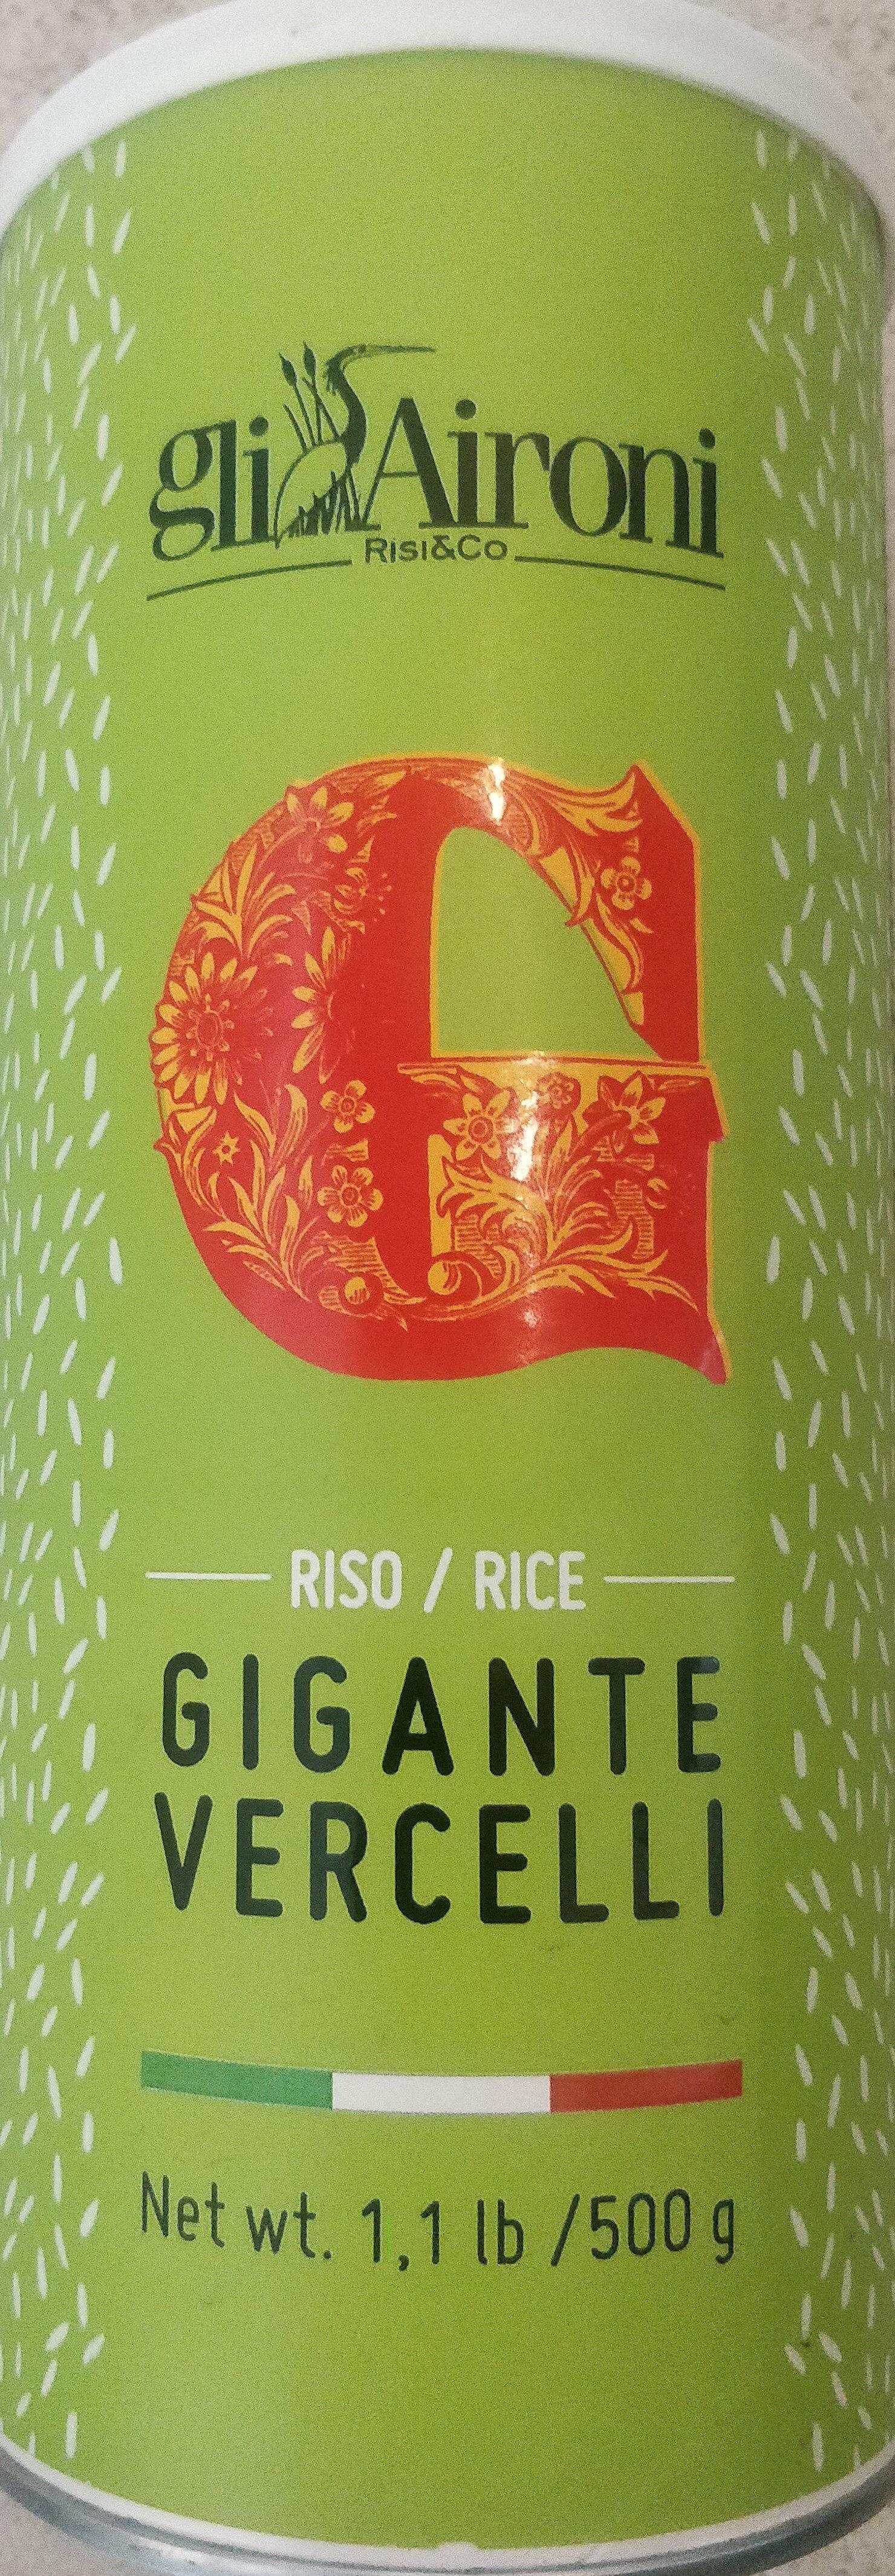 Riso gigante Vercelli - Product - it